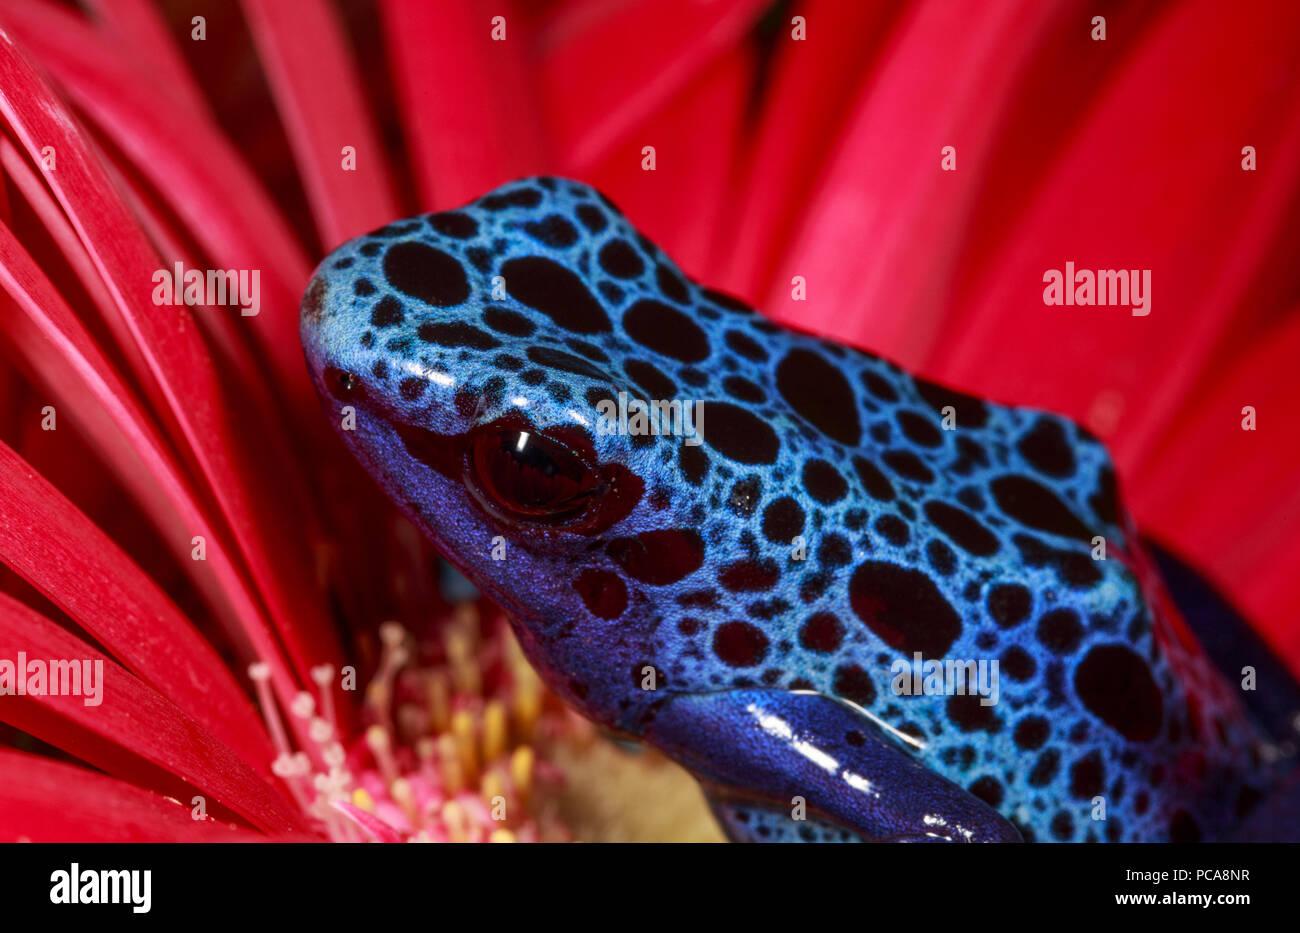 Blue azureus tinctorius dart frog (Dendrobates tinctorius) on a flower. - Stock Image